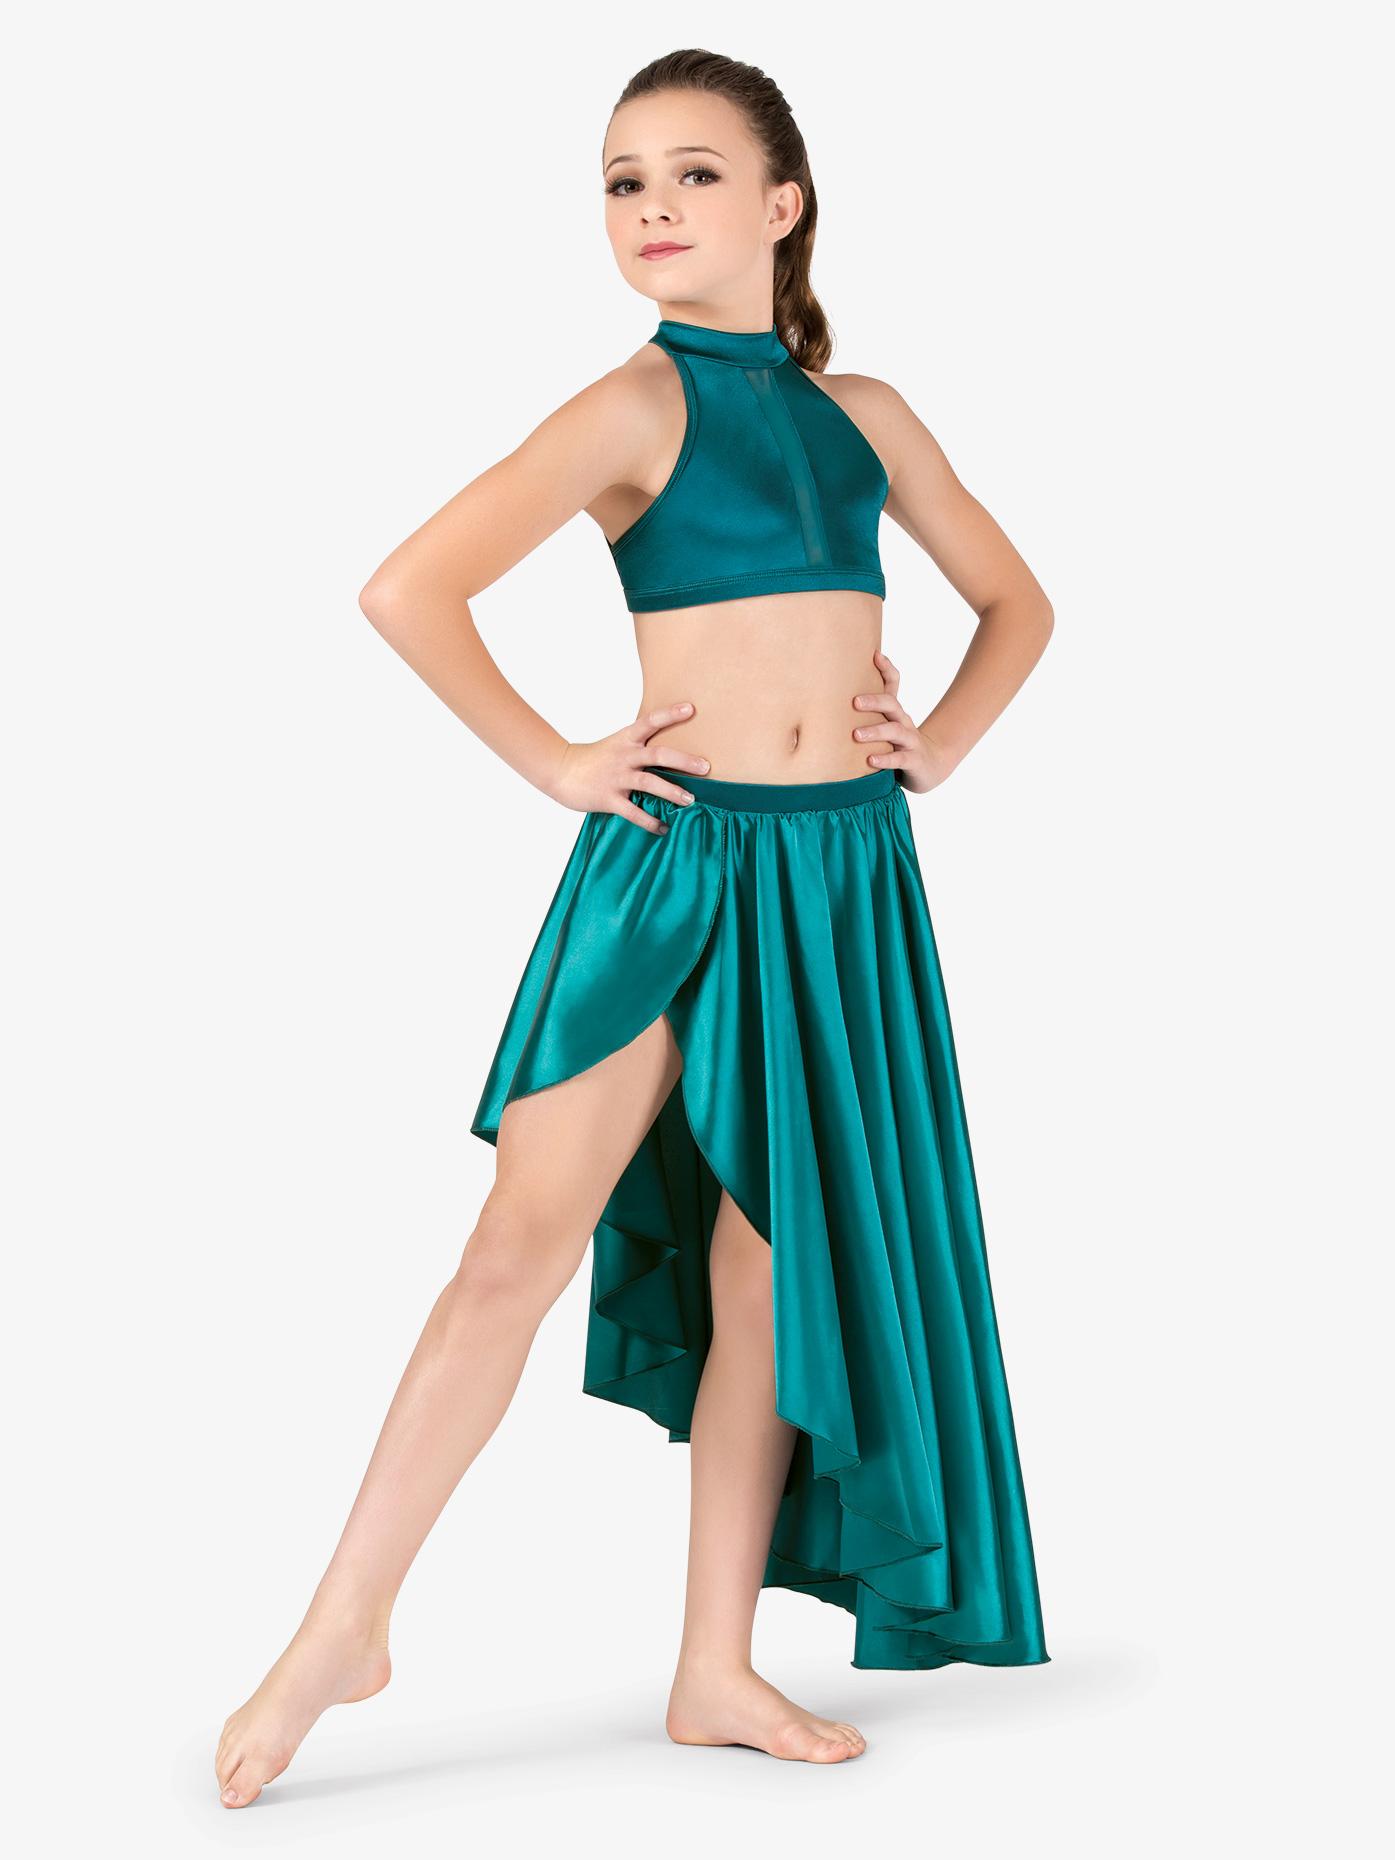 Double Platinum Girls Performance Satin Mock Wrap Skirt N7684C